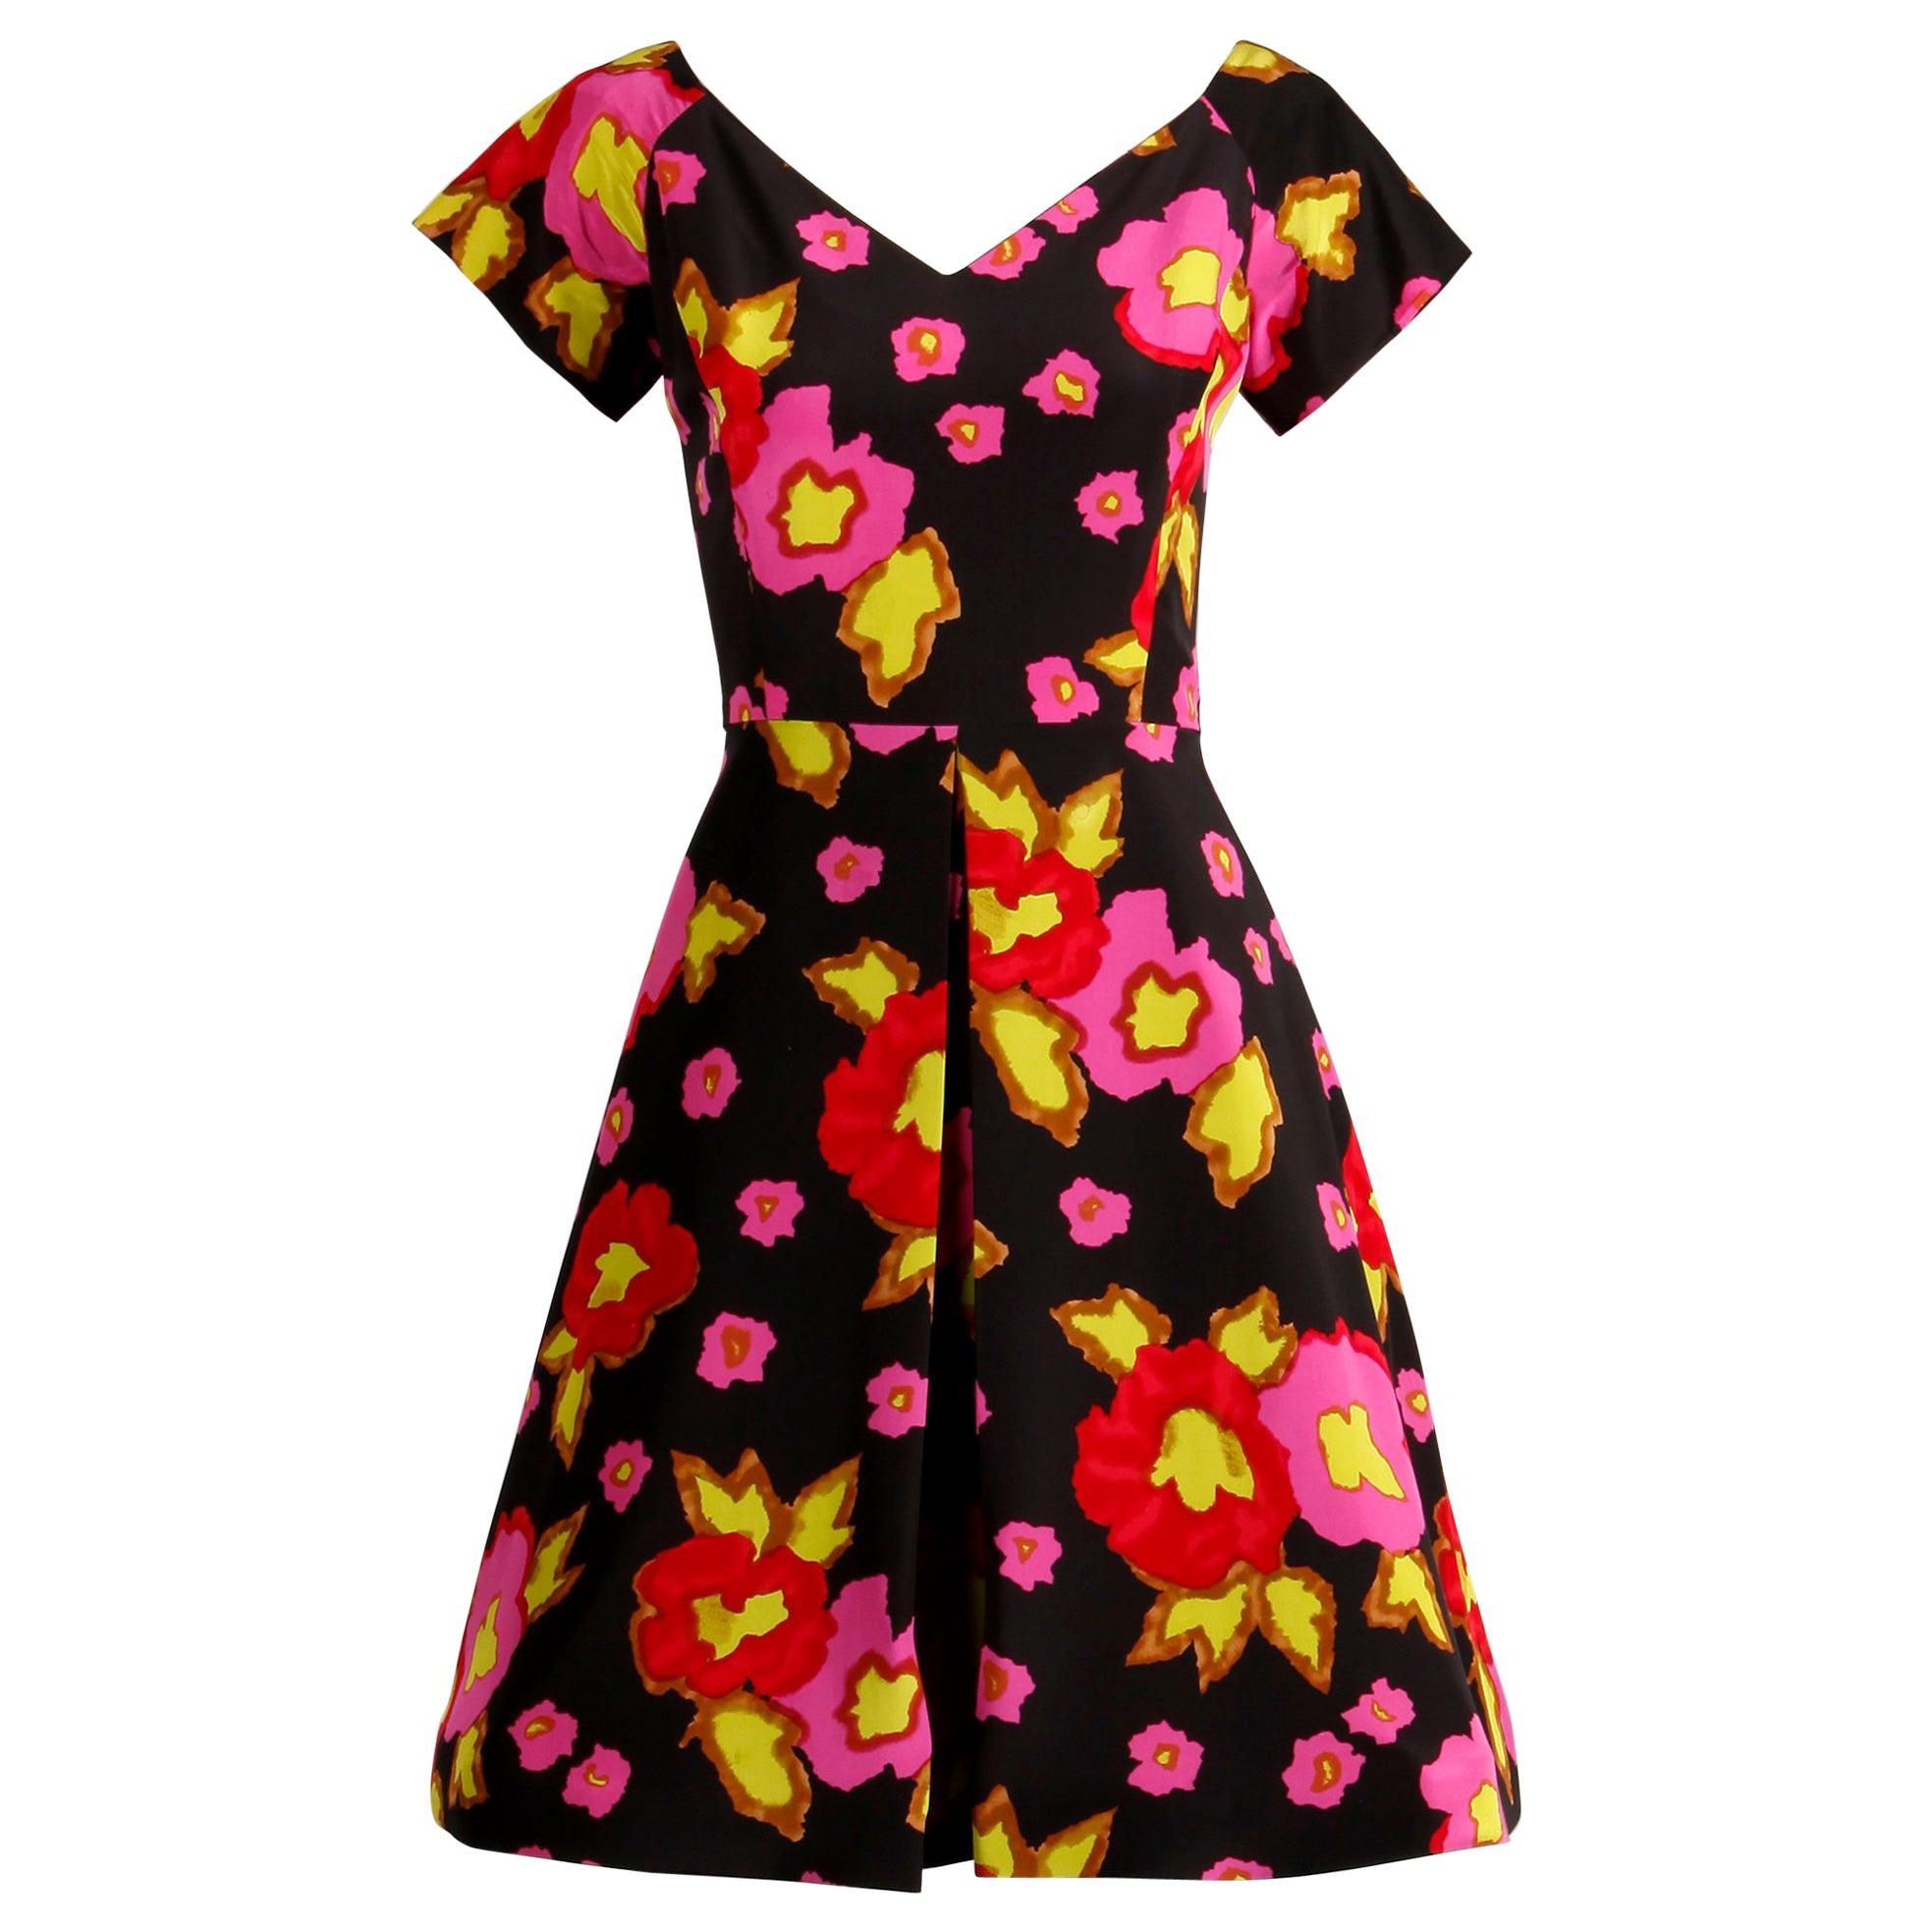 1980s-90s Arnold Scaasi Vintage Bright Pink Red Black Floral Print Silk Dress